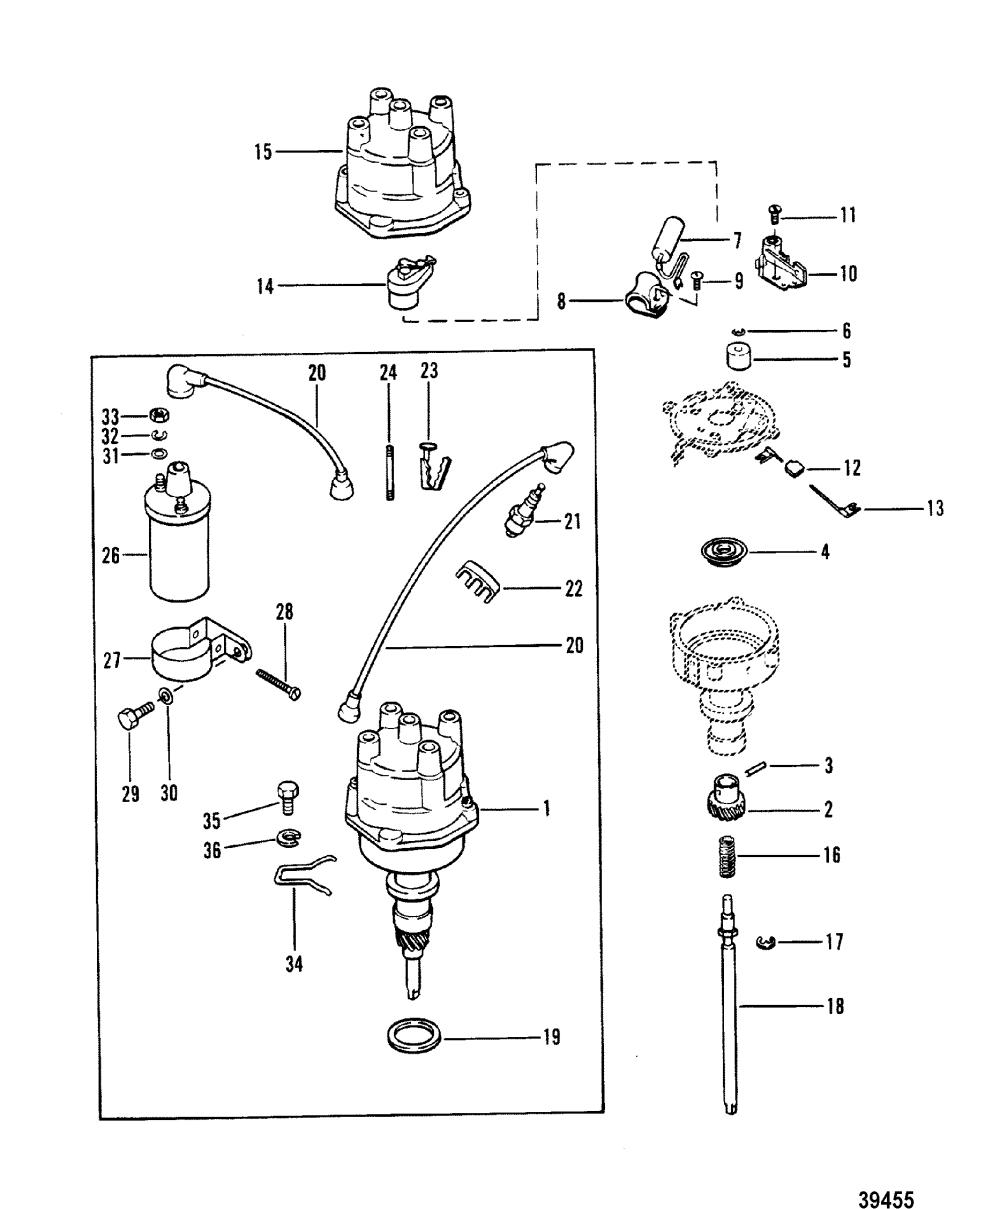 medium resolution of 4 3 mercruiser starter wiring diagram 3 0 mercruiser starter wiring 165 hp mercruiser heat exchanger